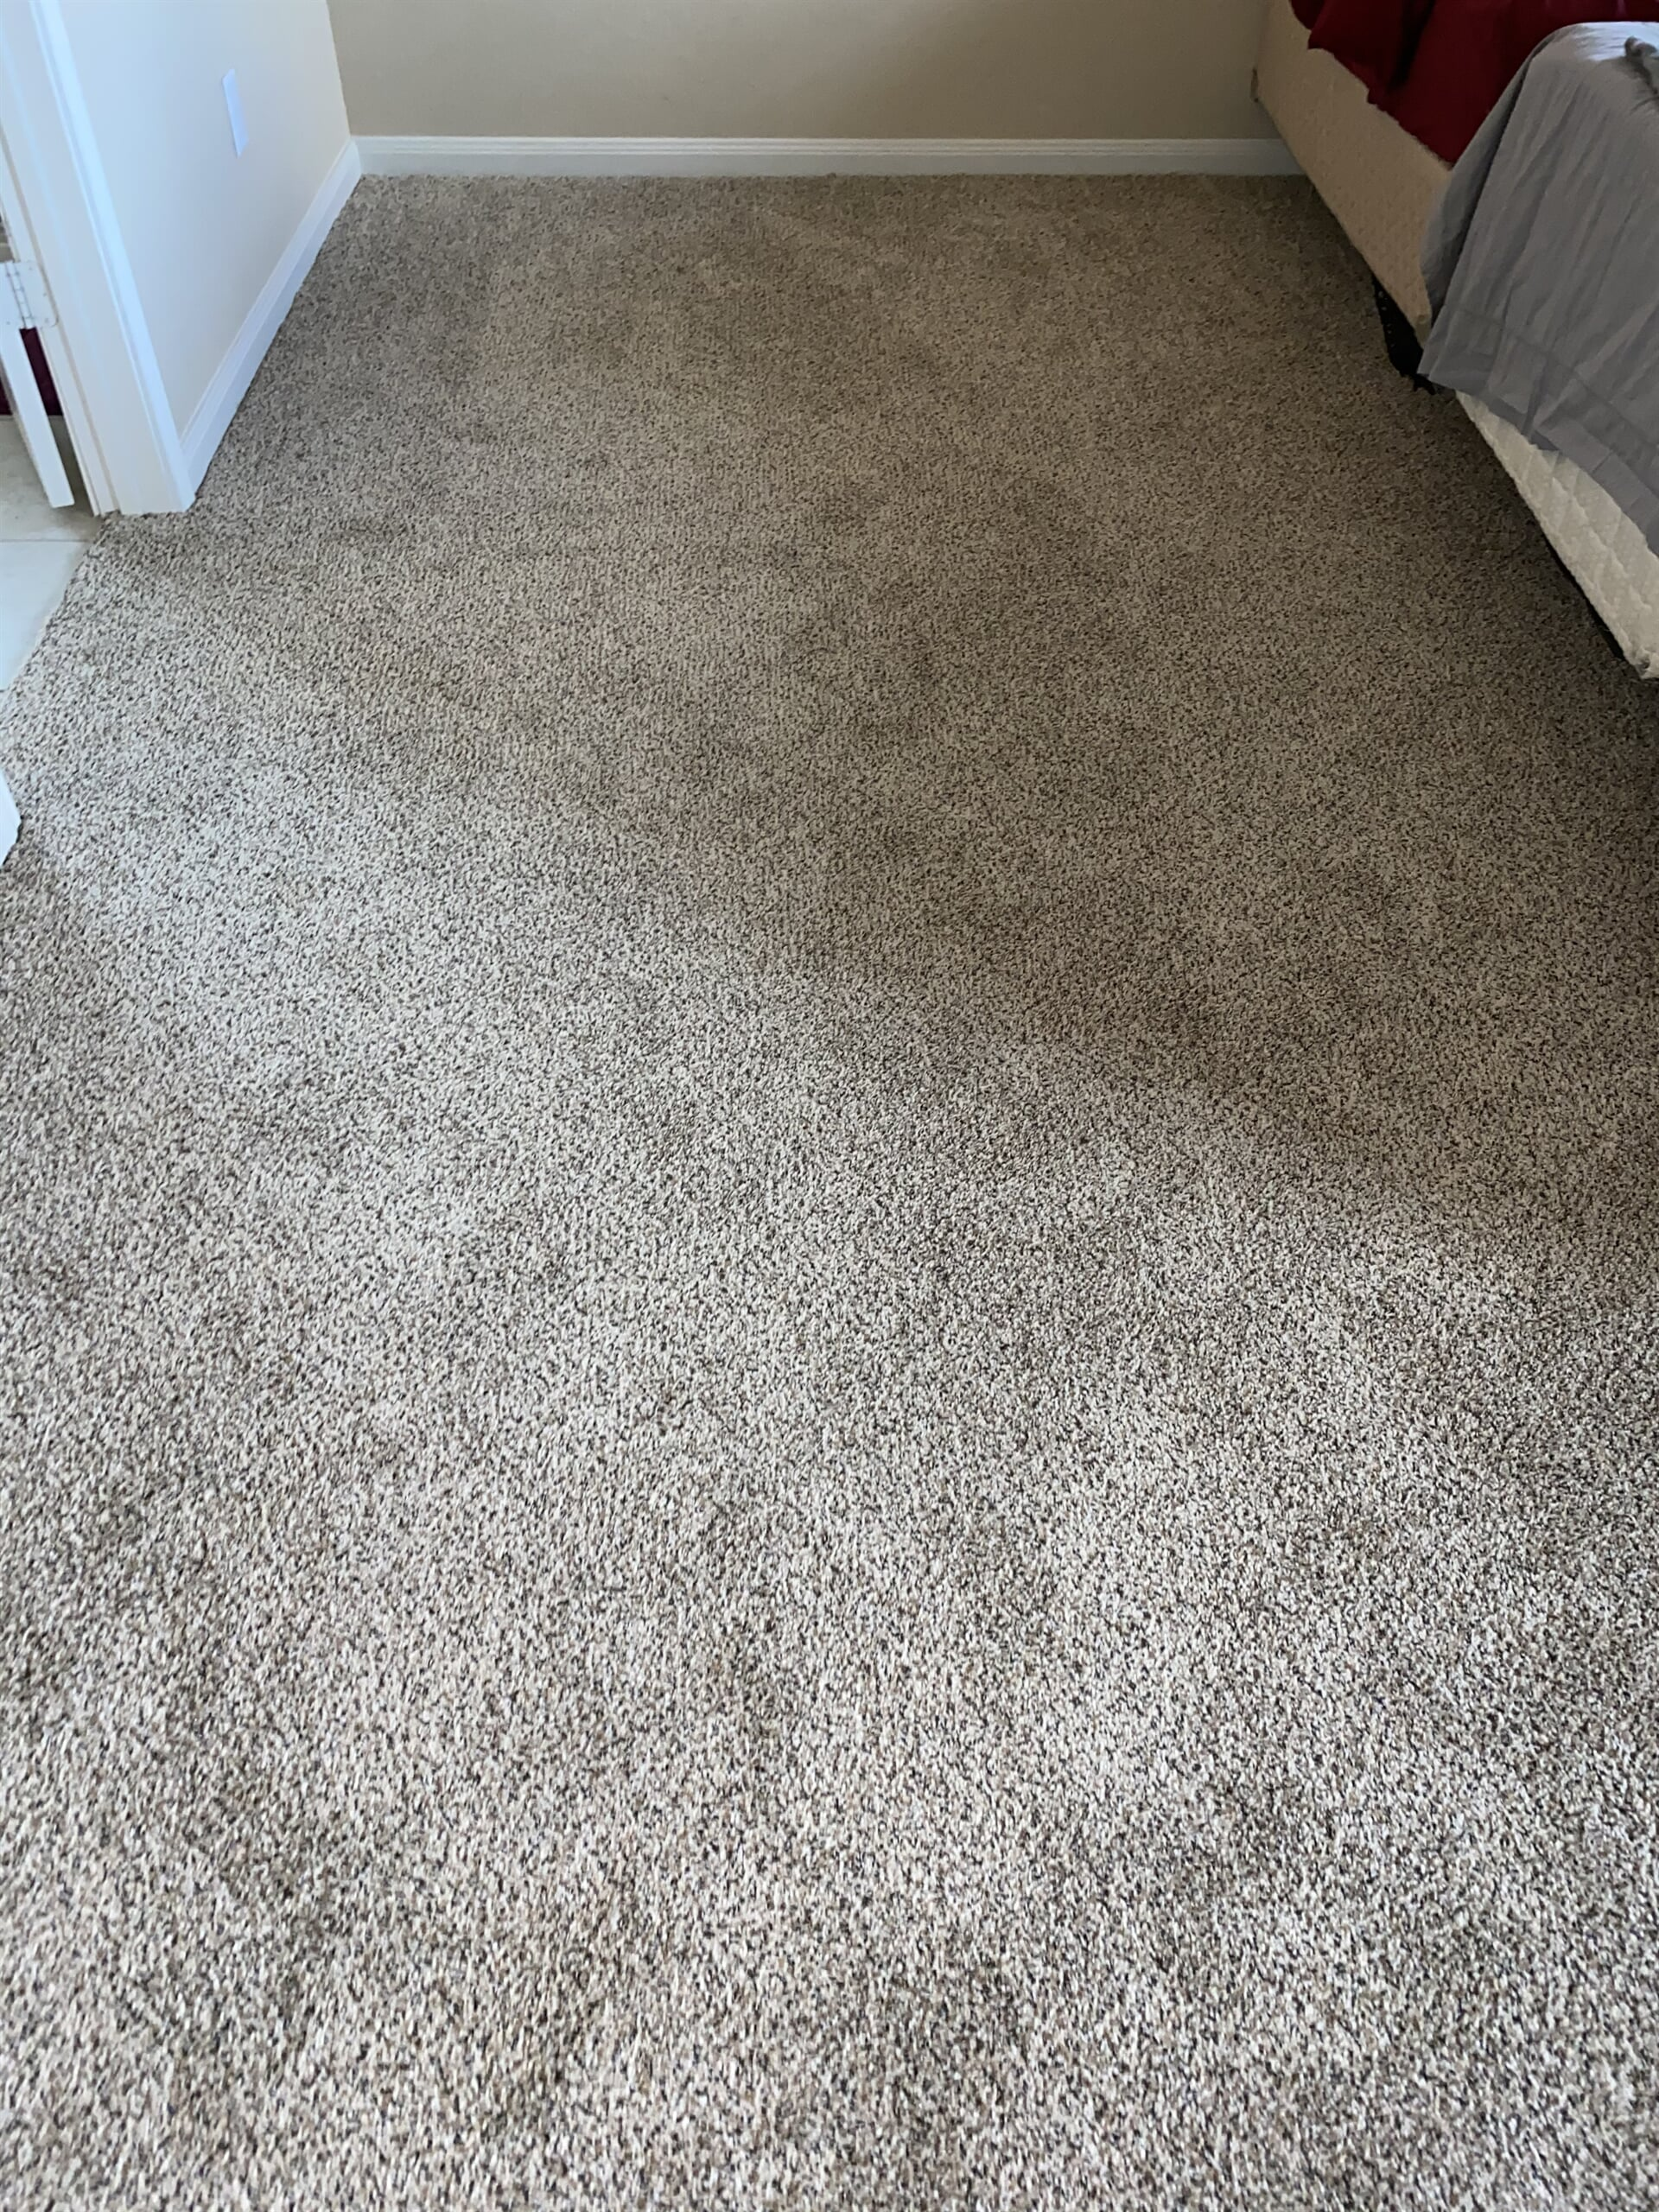 Carpet flooring from Houston Floor Installation Services in Katy, TX